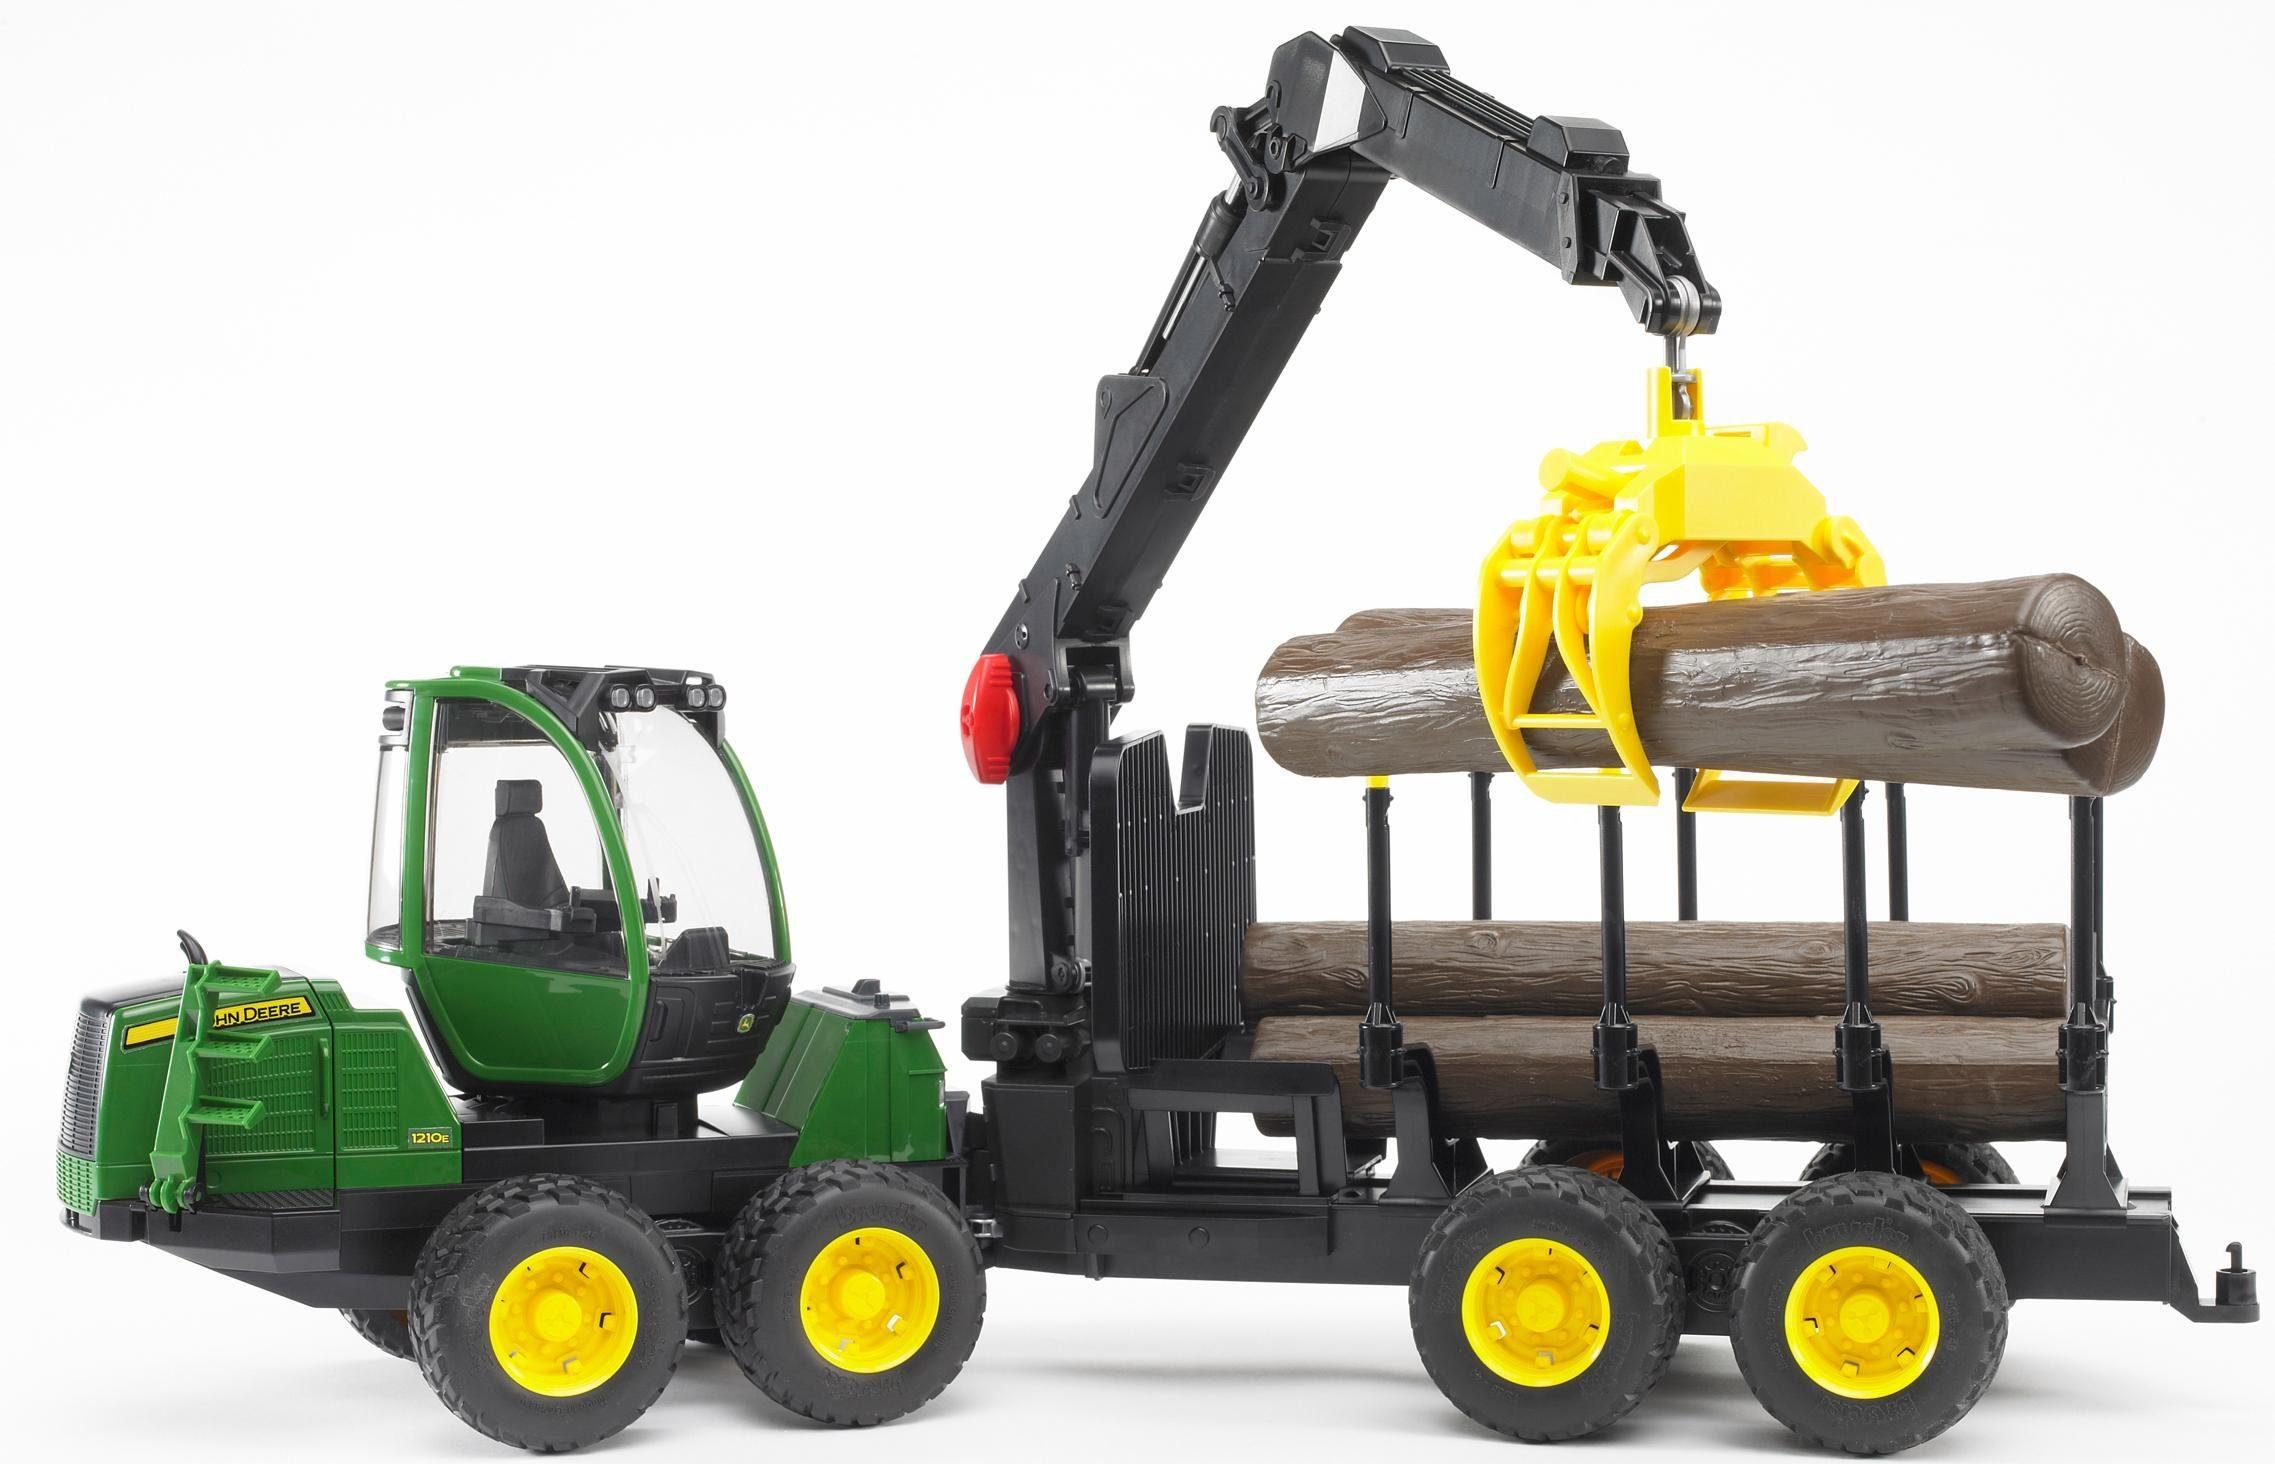 bruder® Spielzeug Forstmaschine 2133, »John Deere 1210E Rückezug mit Greifer, 1:16, grün«